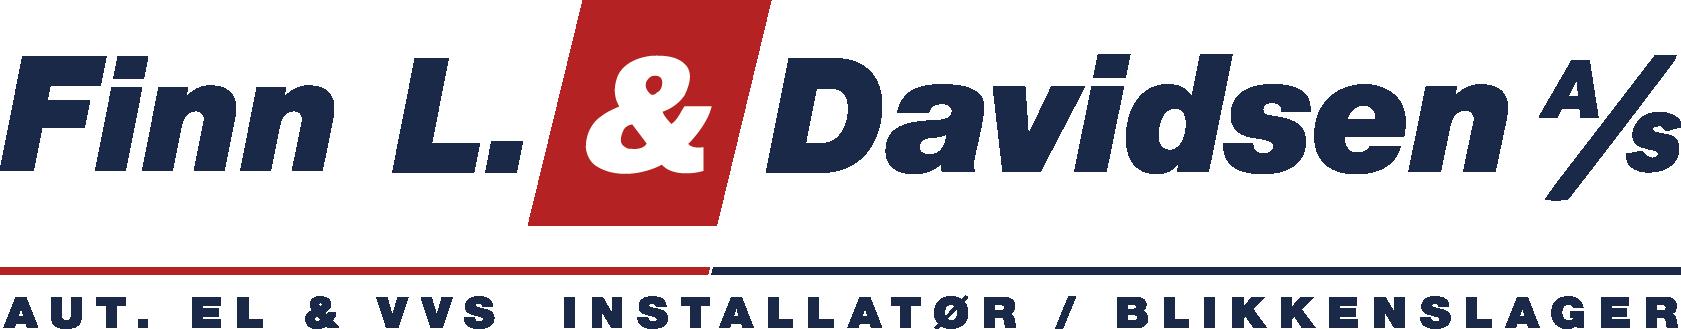 Finn L. & Davidsen karriere